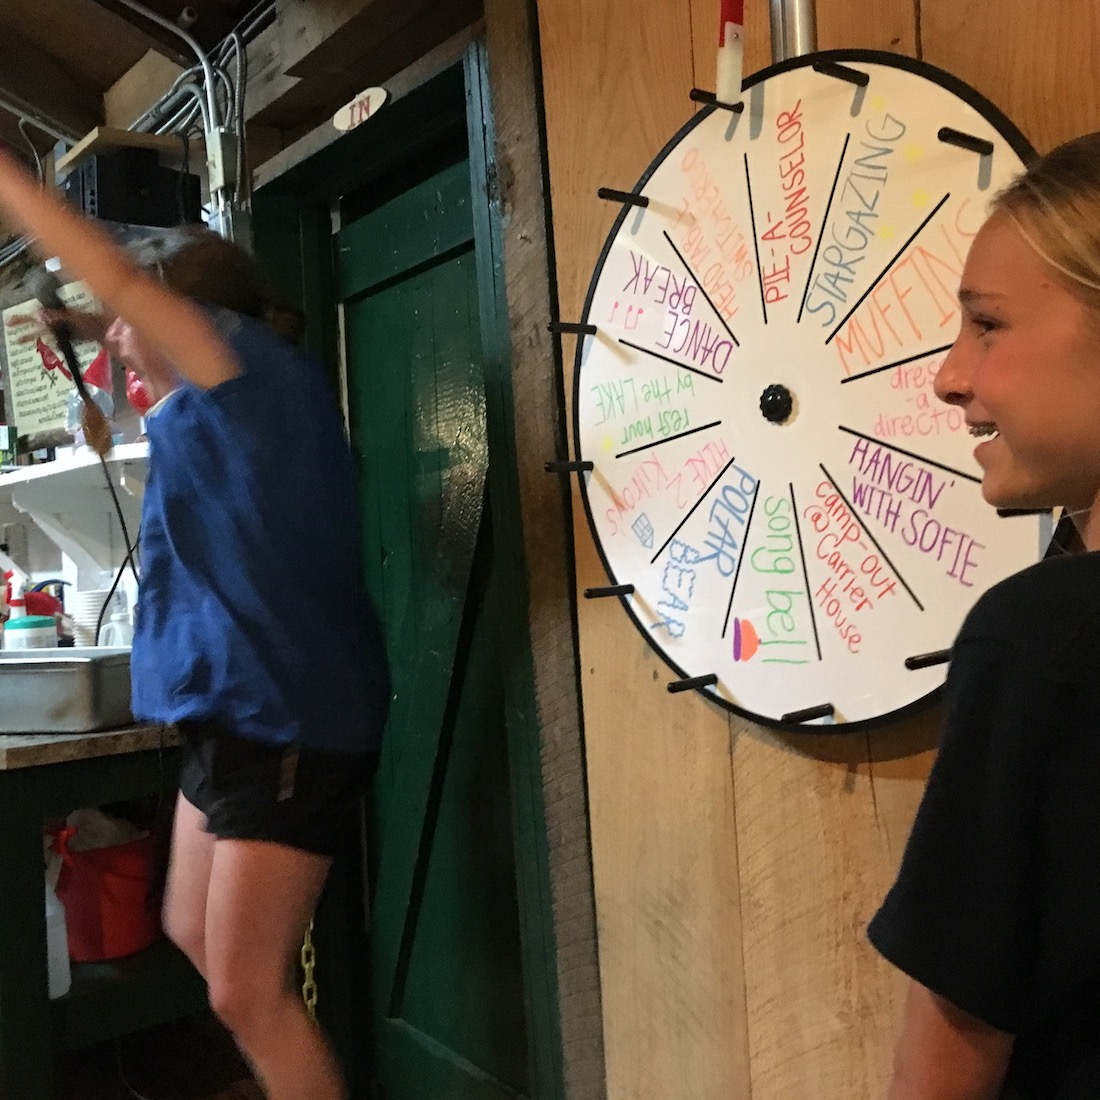 Camp Wheel spin